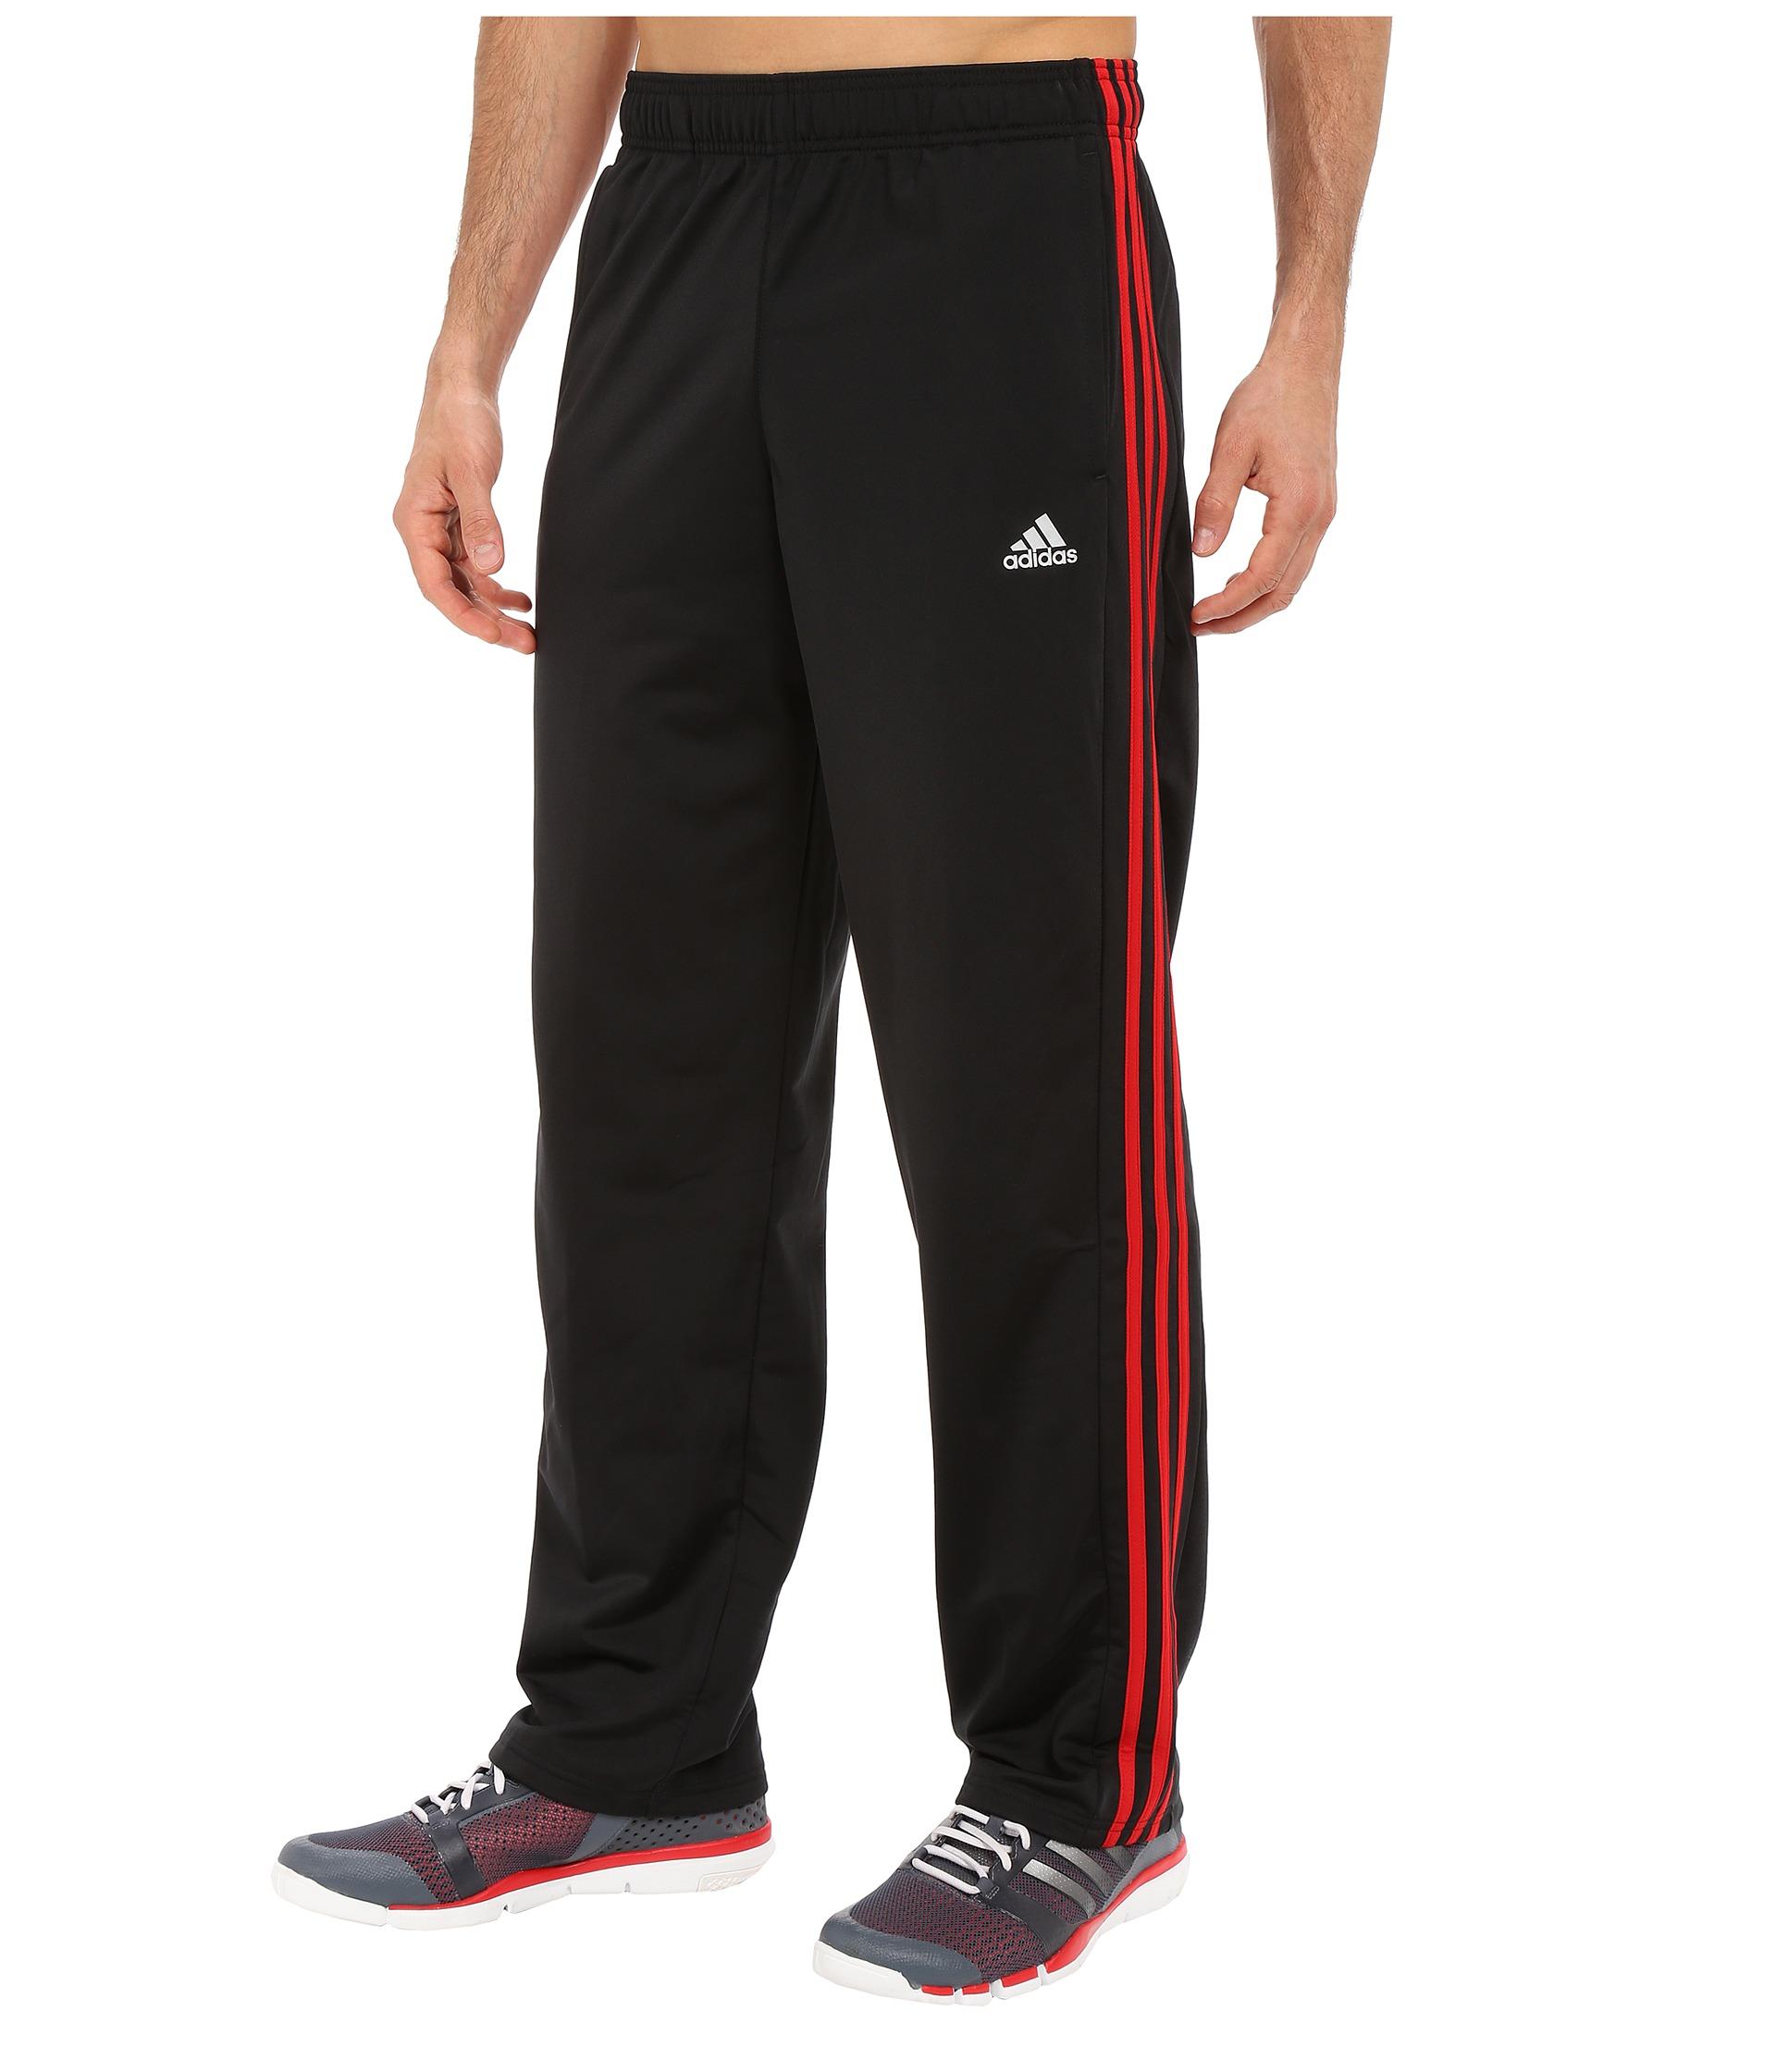 Chándal Chándal Pantalón Pantalón Pantalón Essentials Adidas Tejido De xwnw8